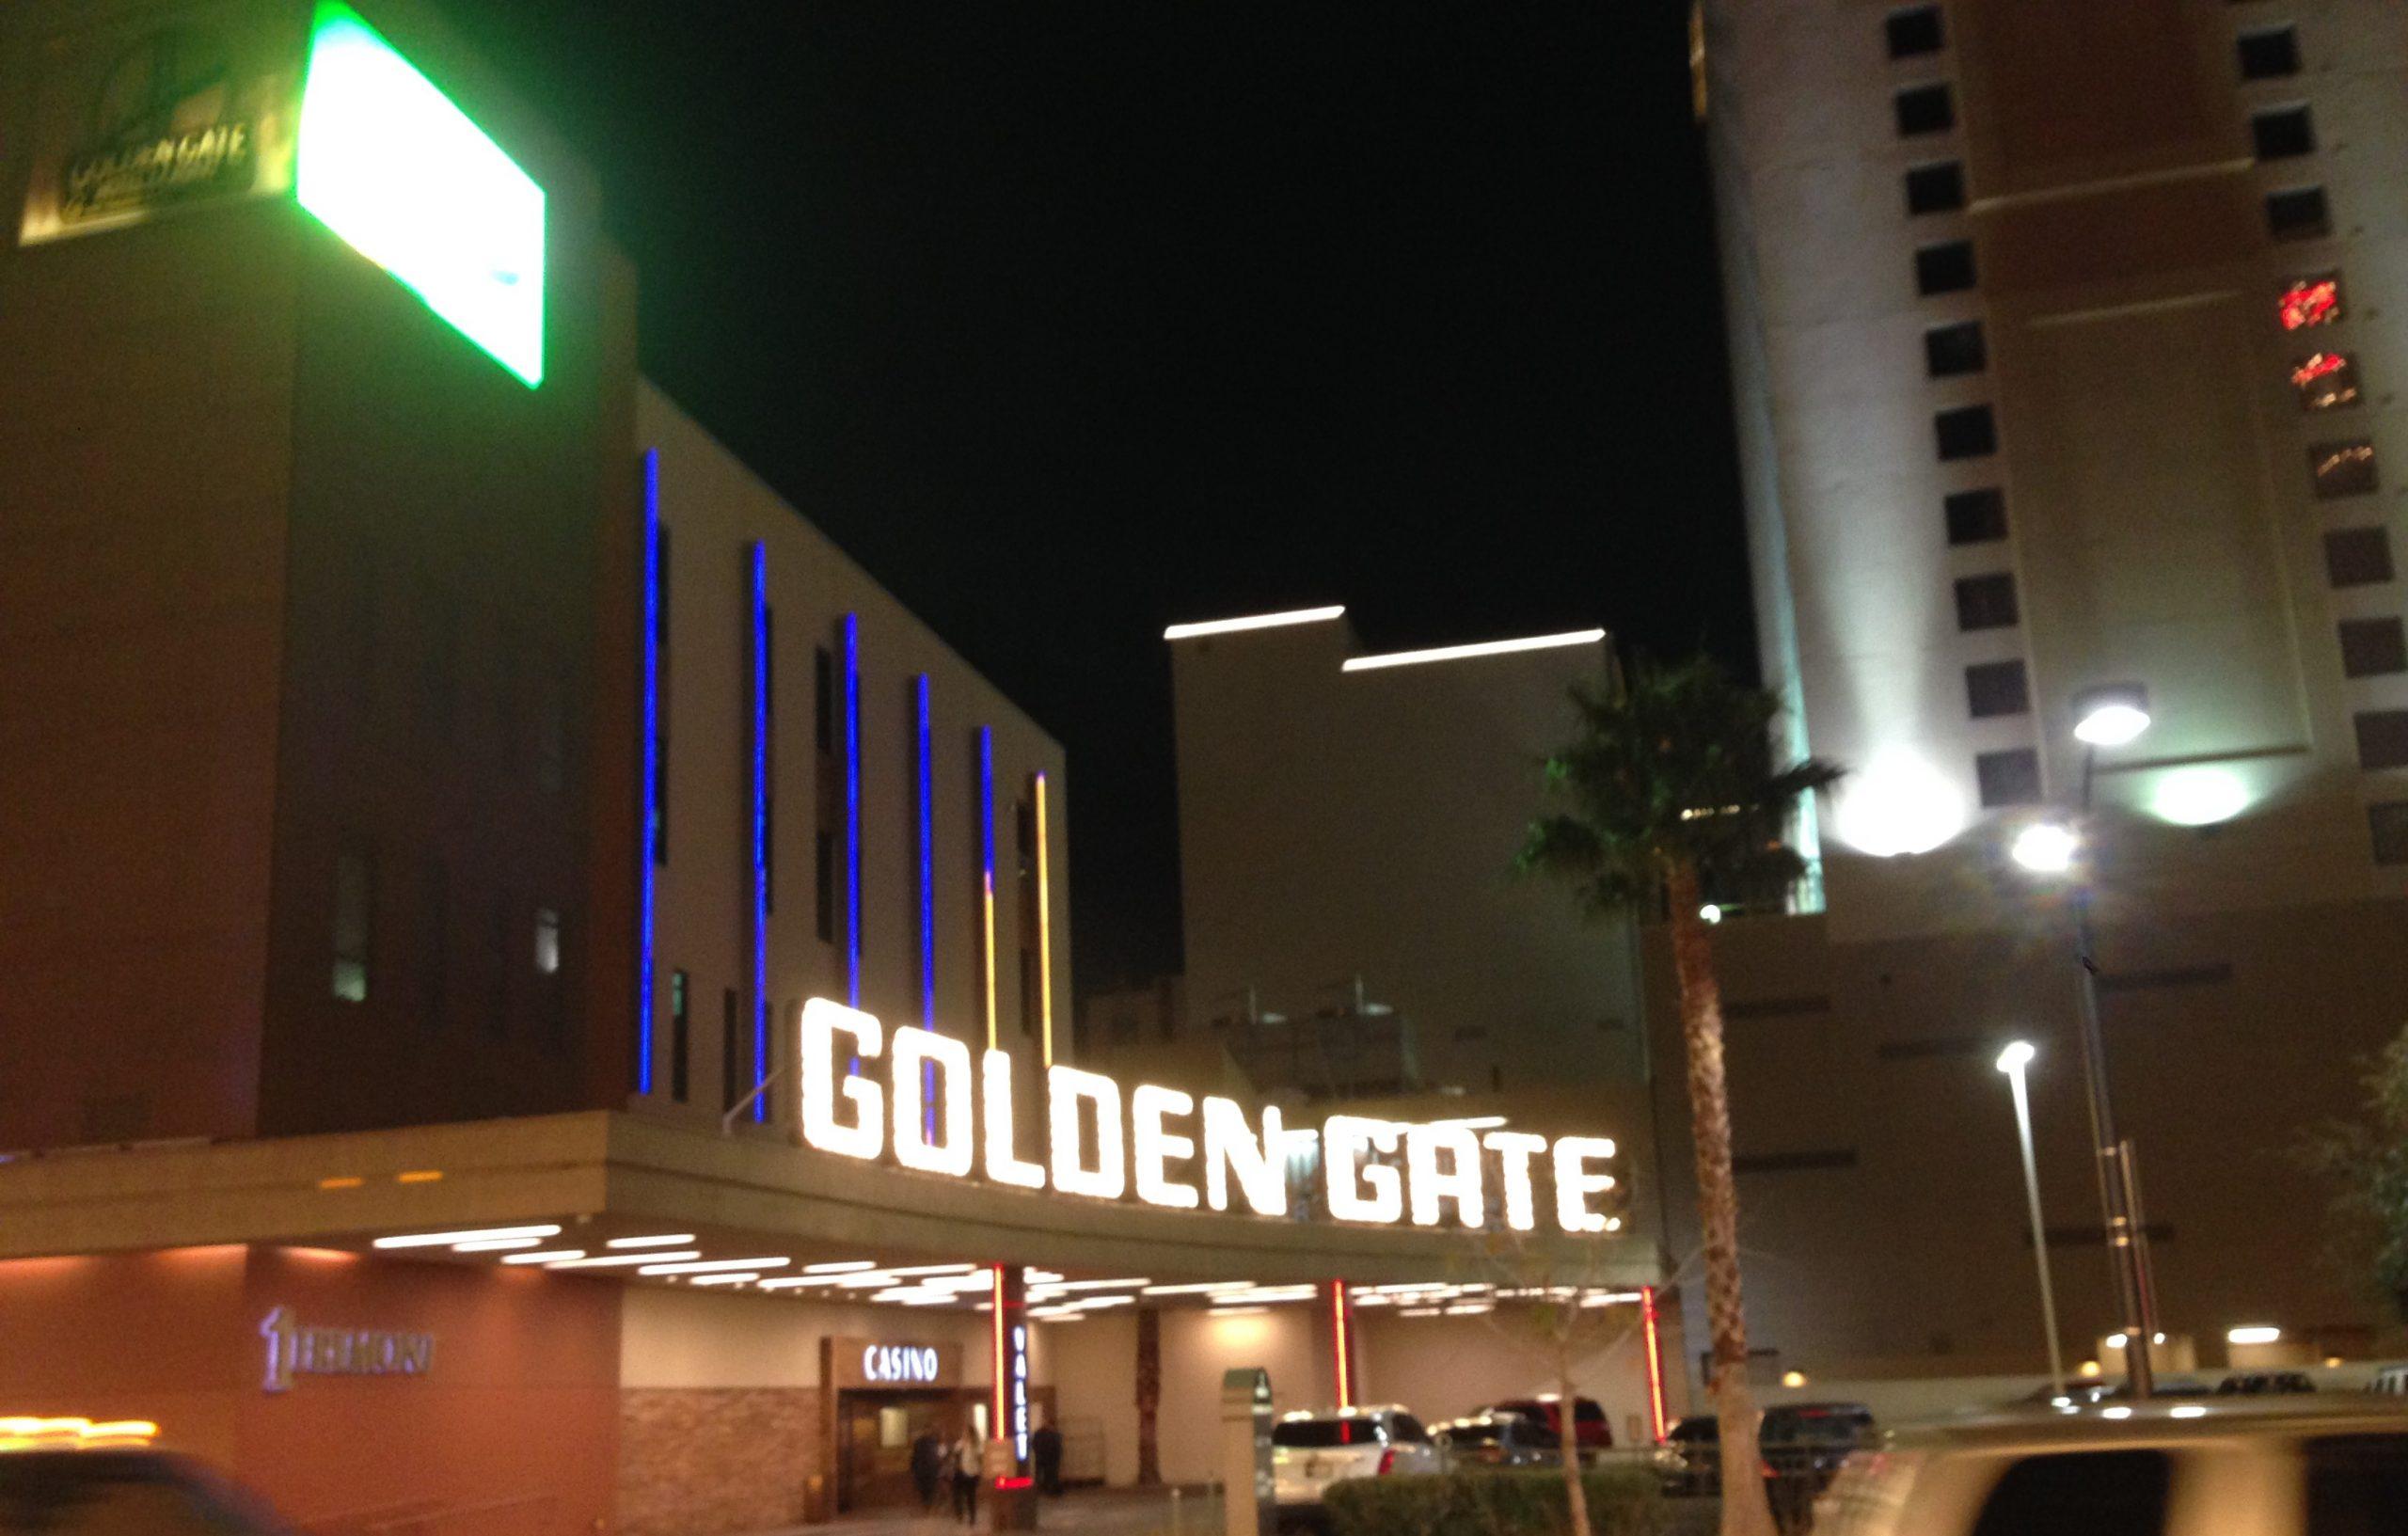 Golden Gate Las Vegas, Golden Gate Casino 2019, Golden Gate Hotel and Casino 2019, Las Vegas 2019, Golden Gate Casino 2019